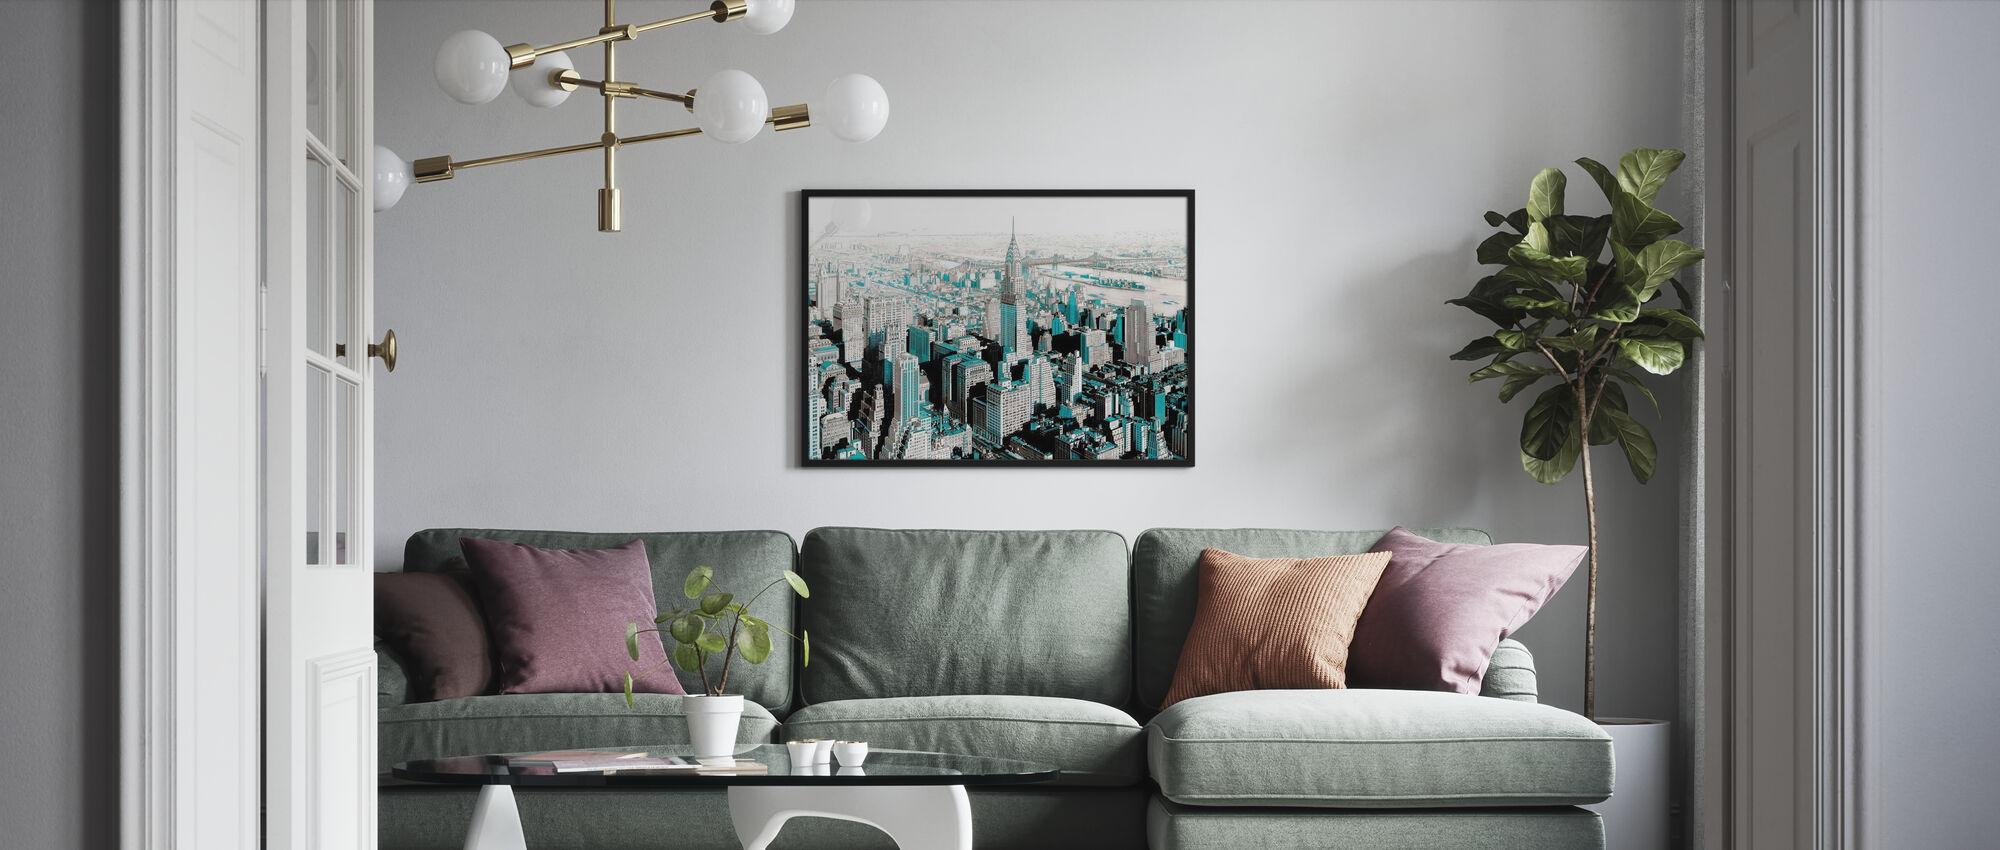 New York City Skizze - Colorspash - Poster - Wohnzimmer